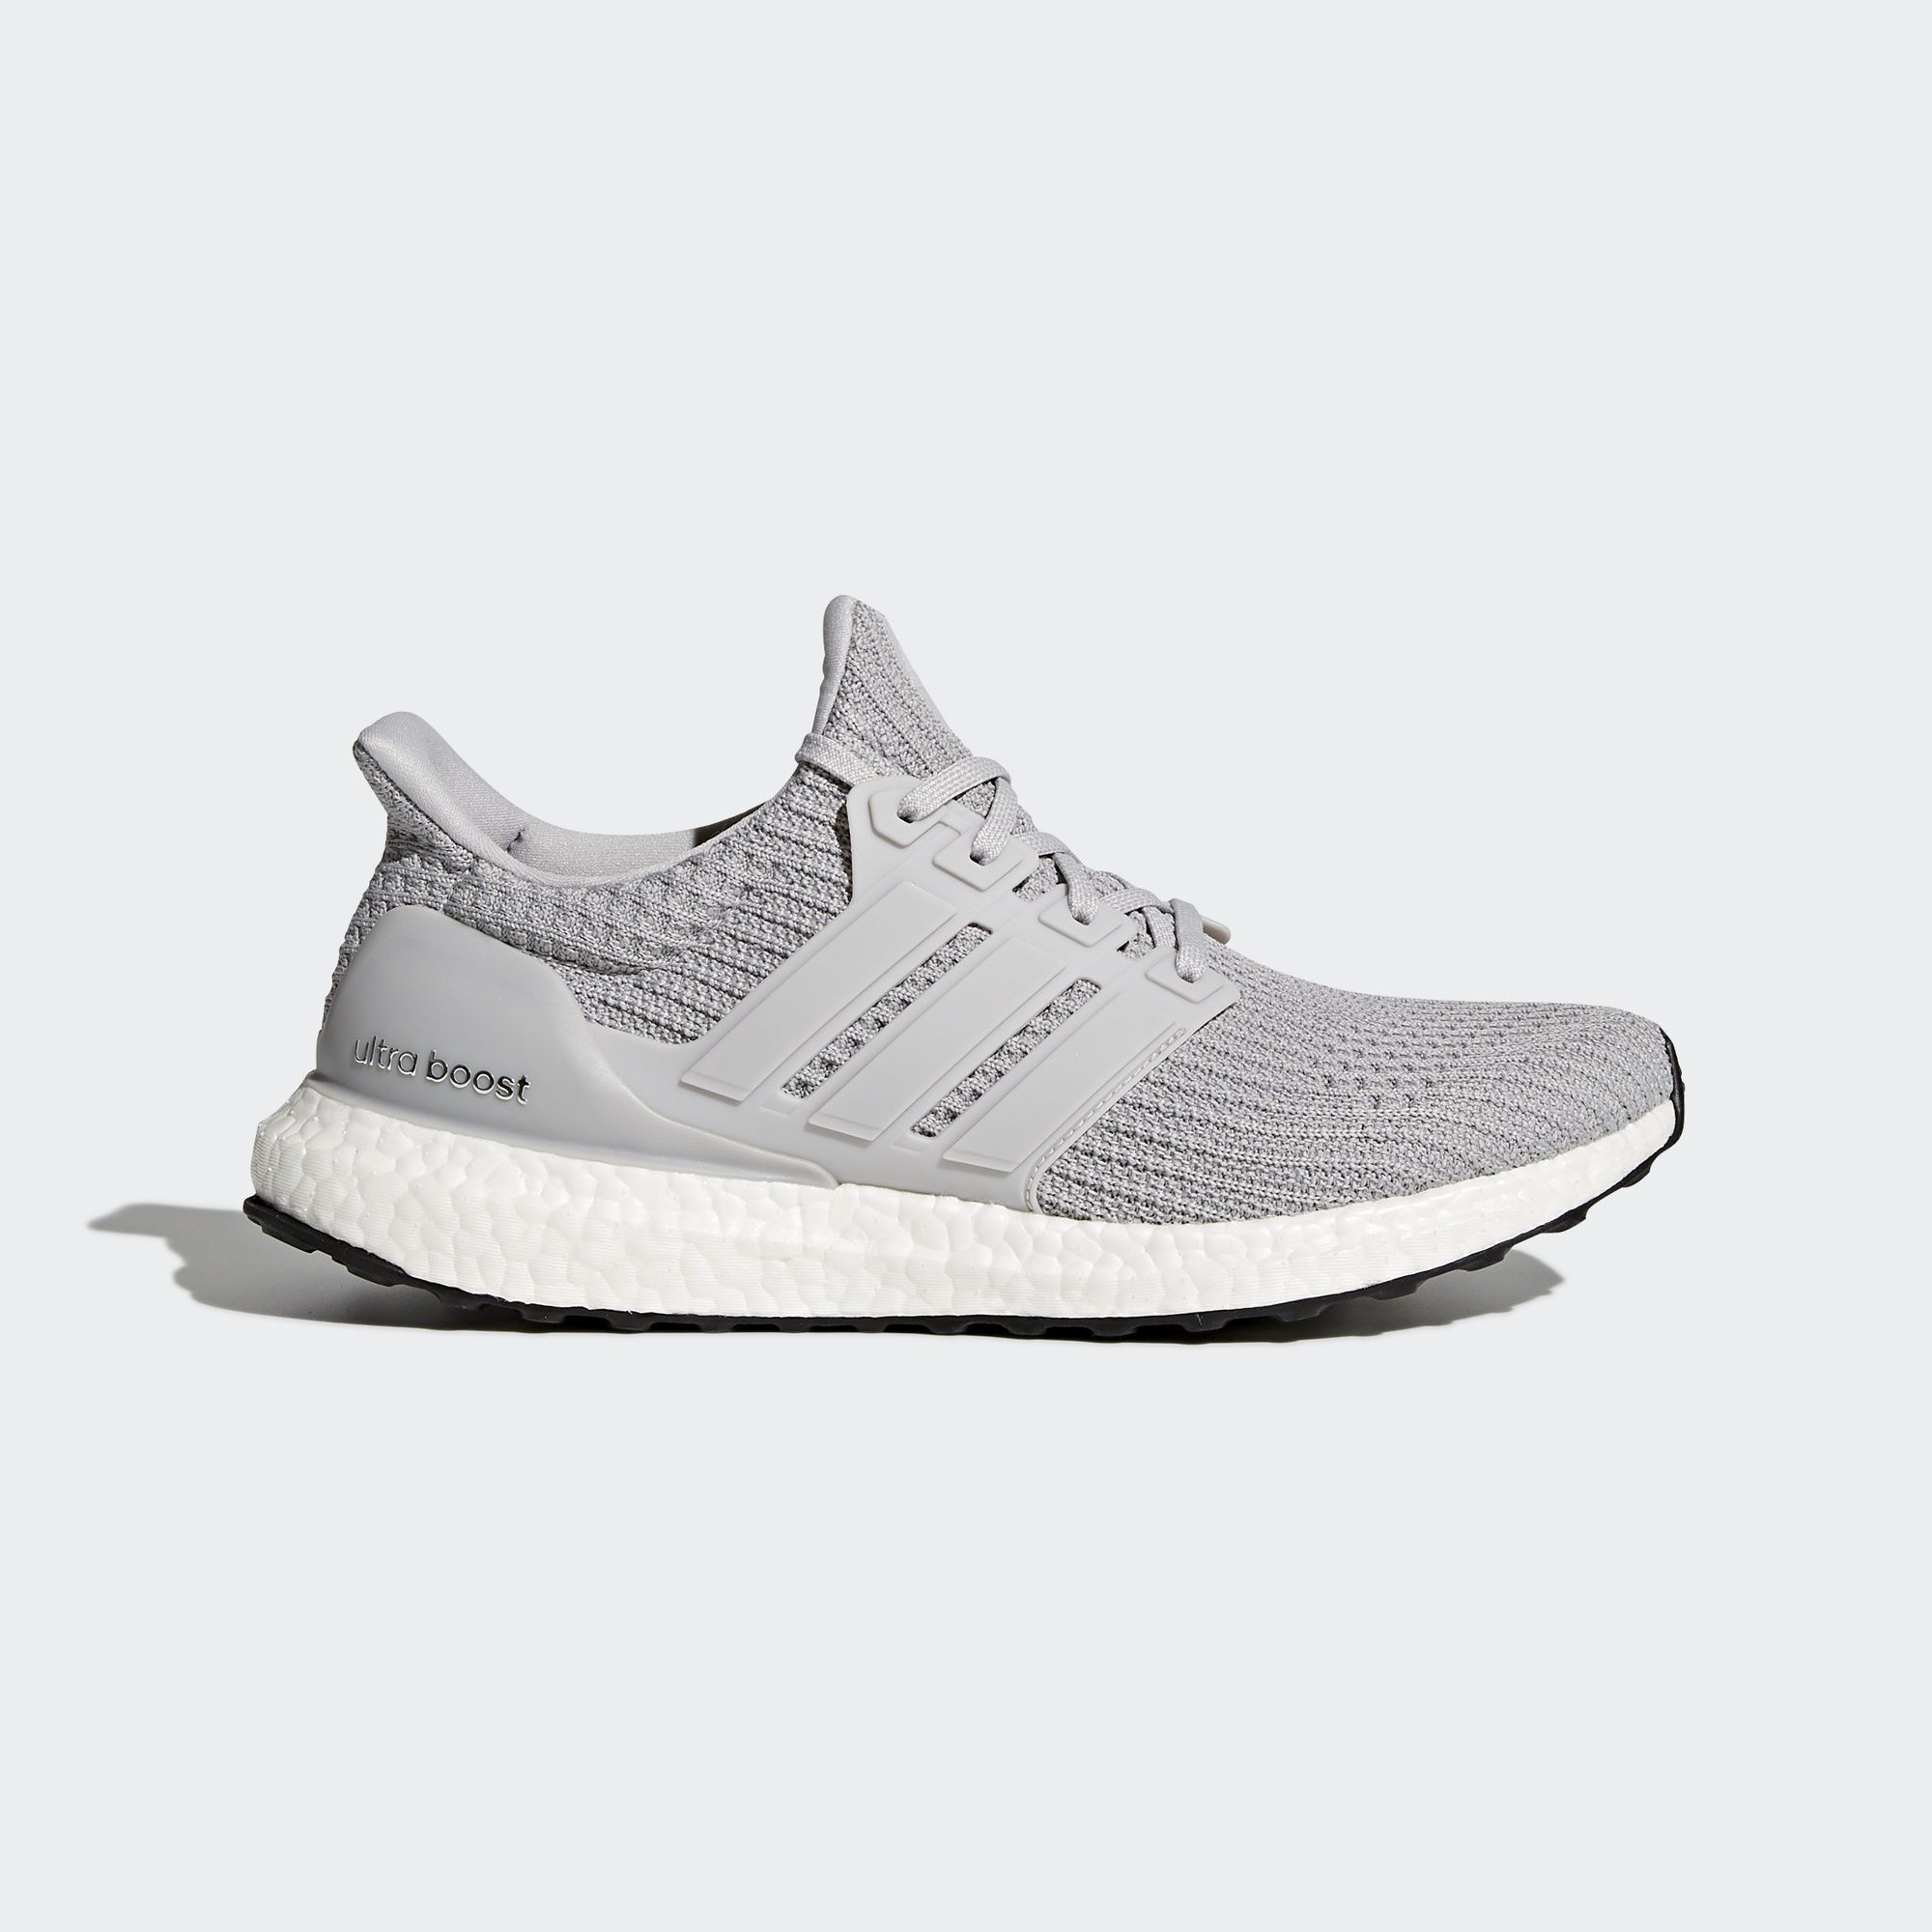 Adidas Ultraboost Shoes Grey Adidas Us Running Shoes For Men Sneakers Running Shoes Grey